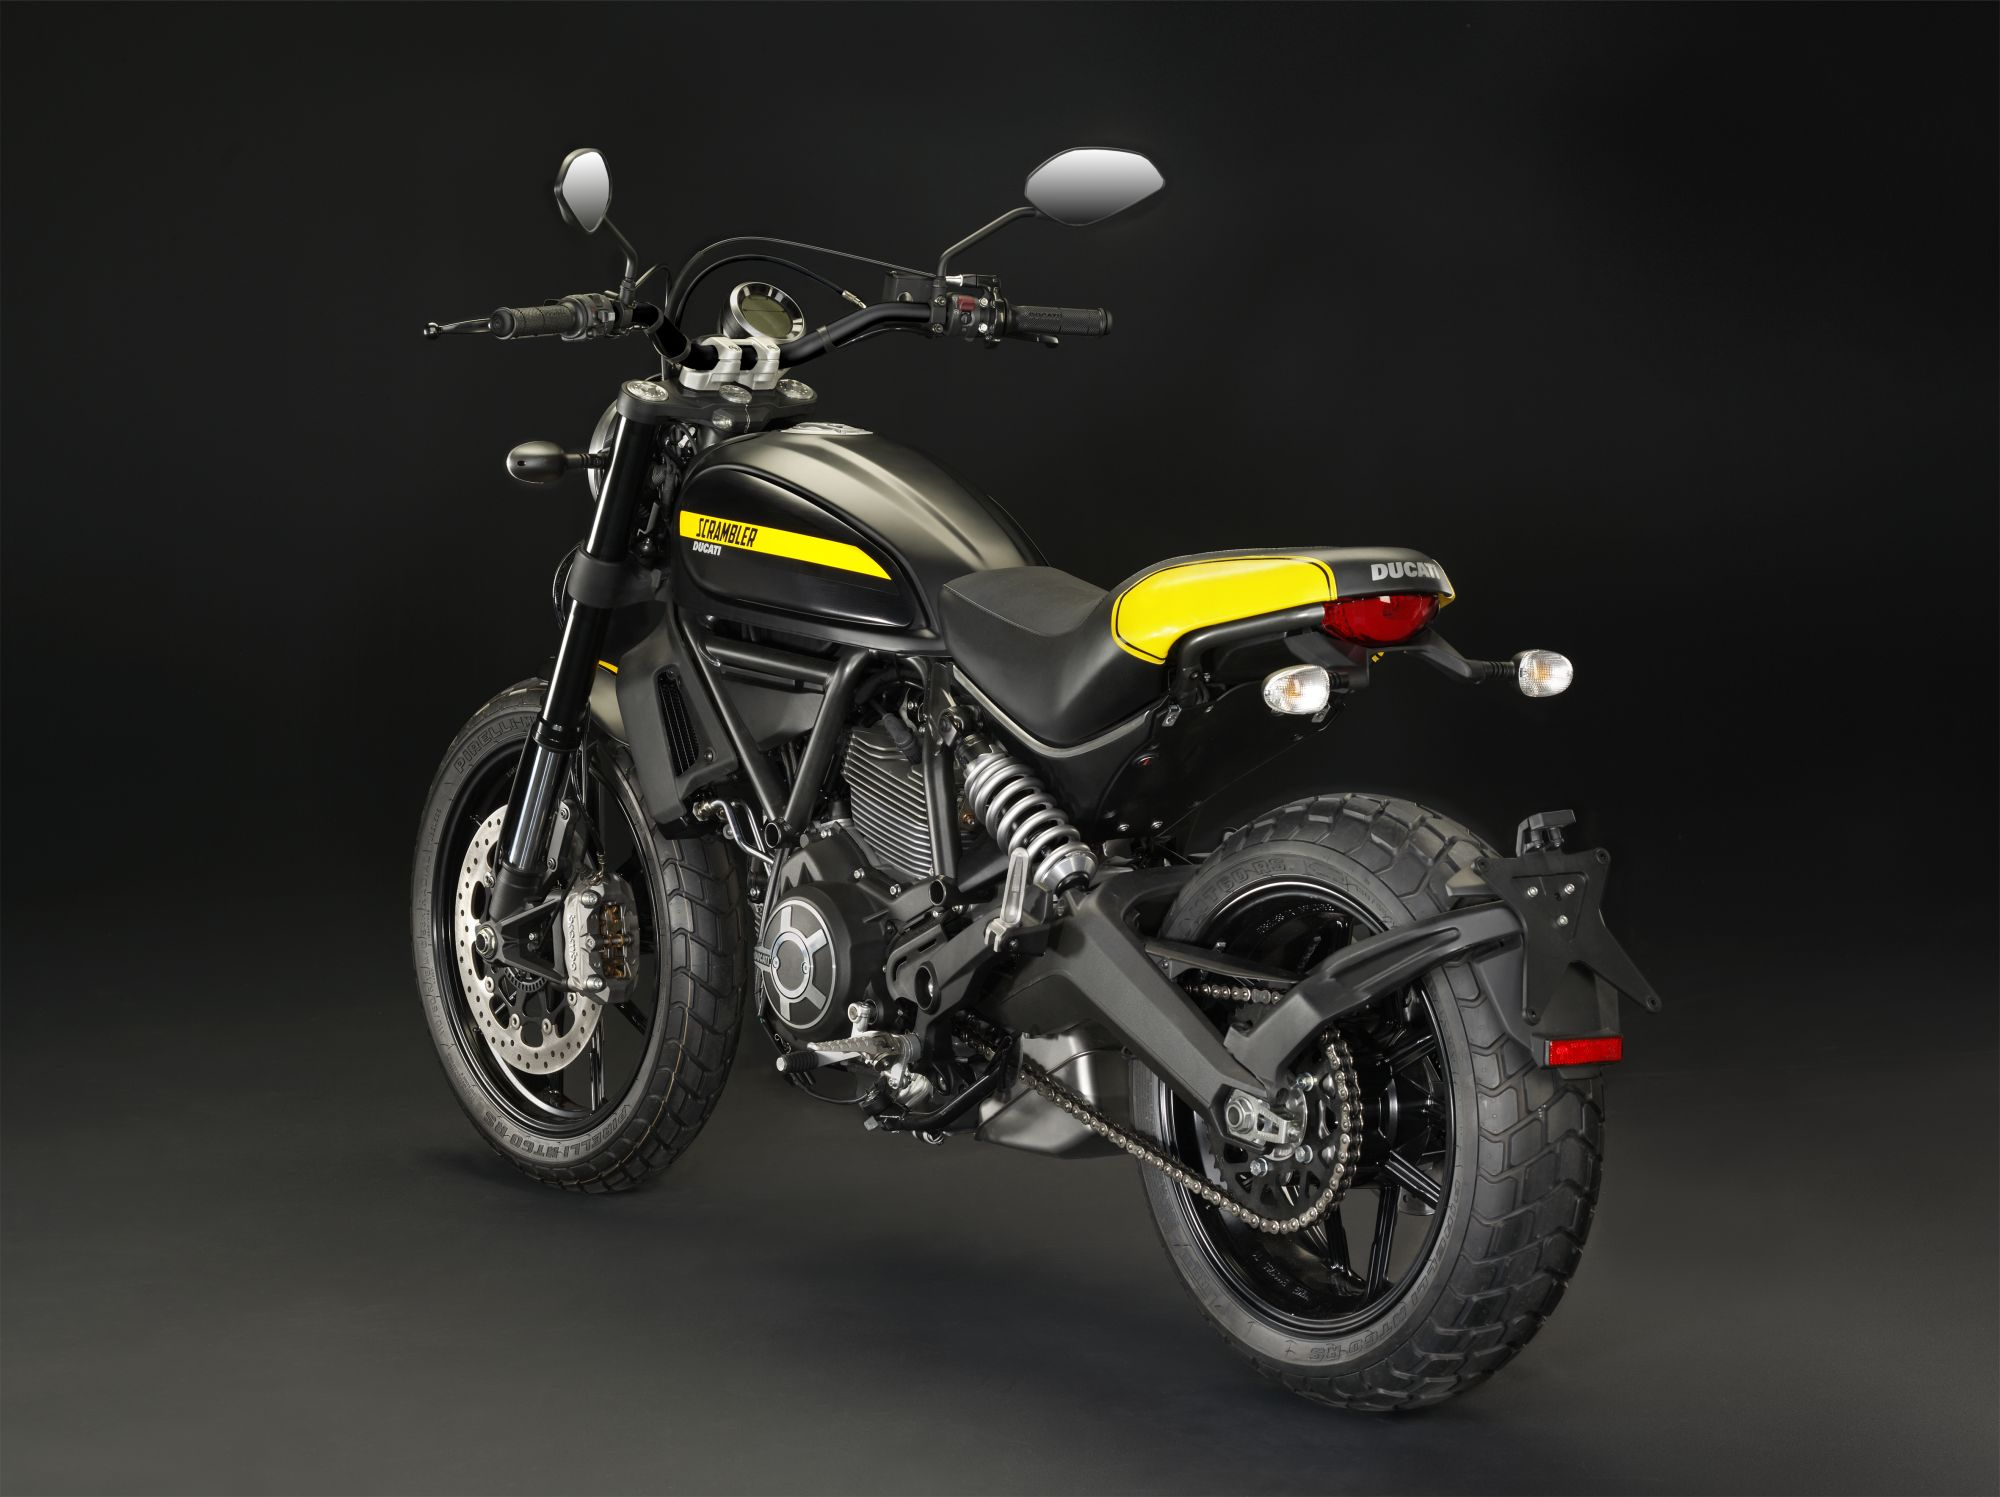 motorrad occasion ducati scrambler full throttle kaufen. Black Bedroom Furniture Sets. Home Design Ideas